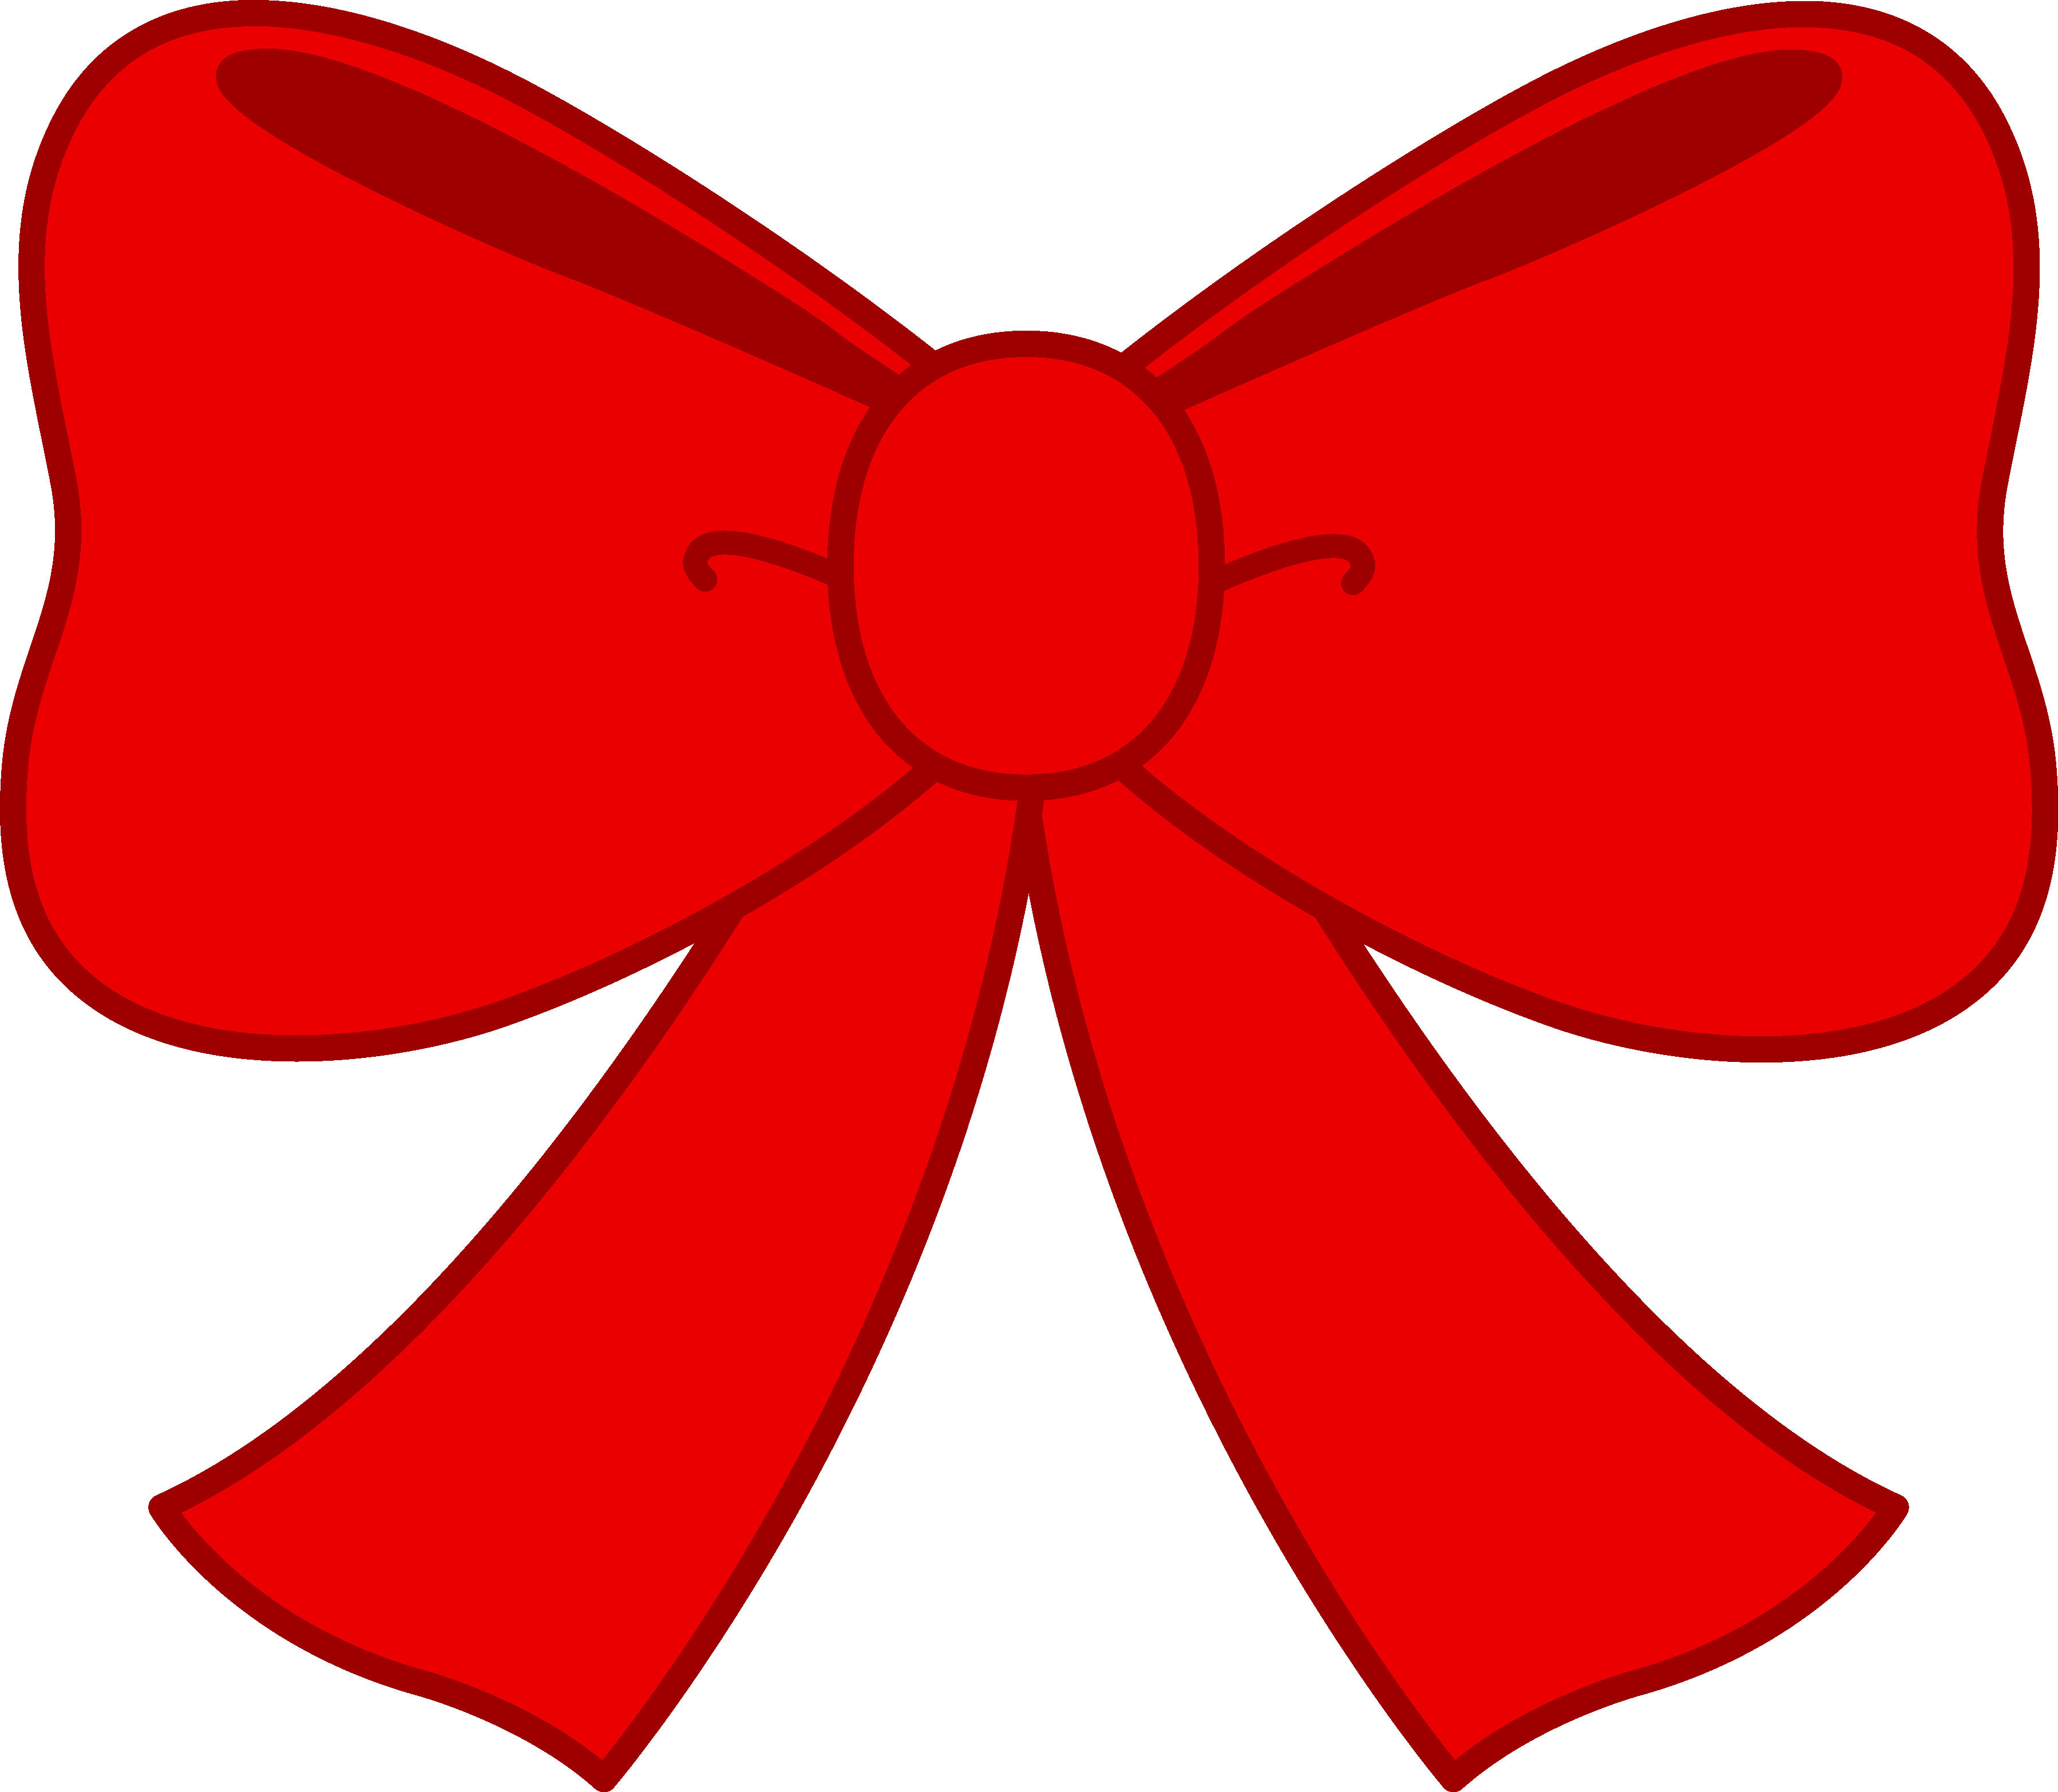 Cute Red Bow Clipart - Free Clip Art - Cute Bow PNG HD